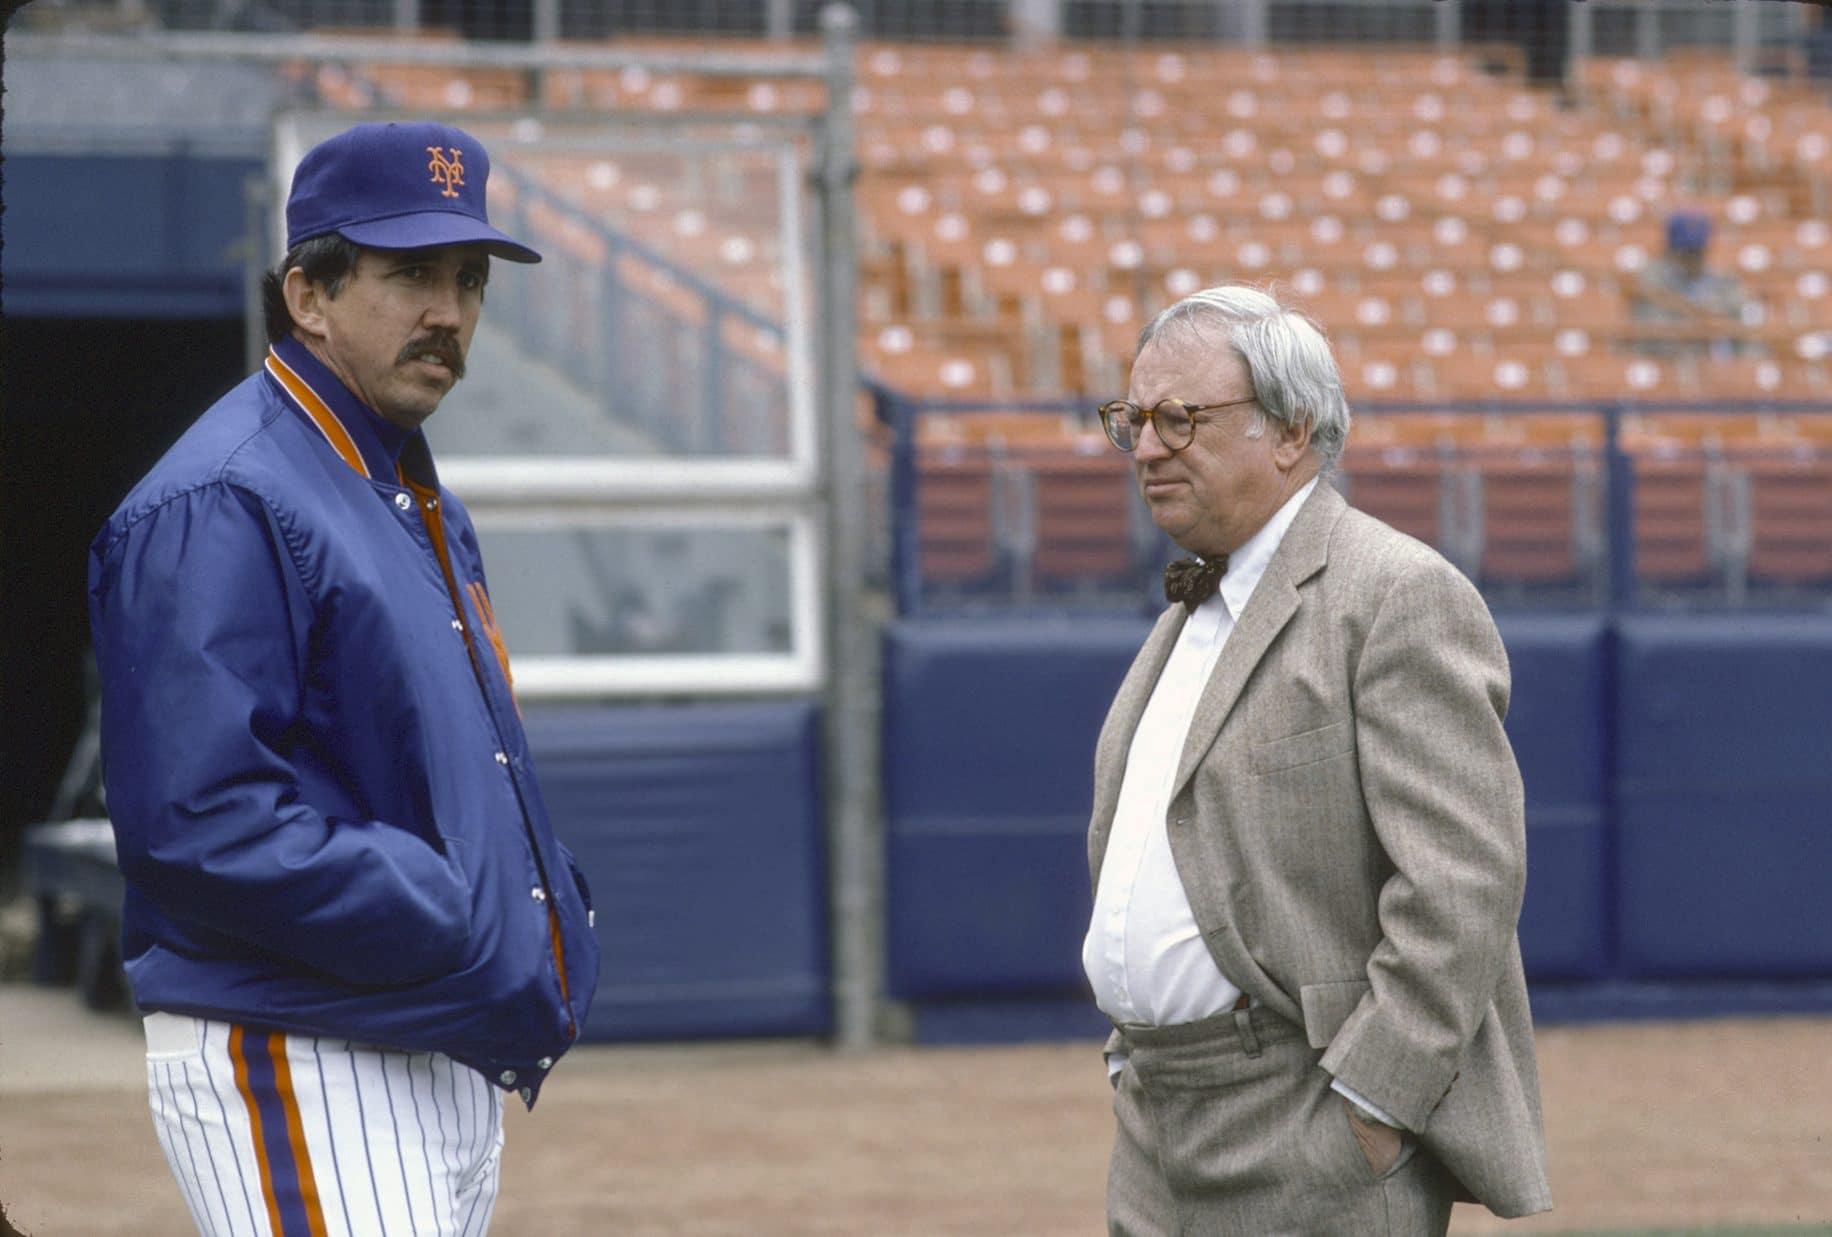 Davey Johnson Frank Cashen New York Mets